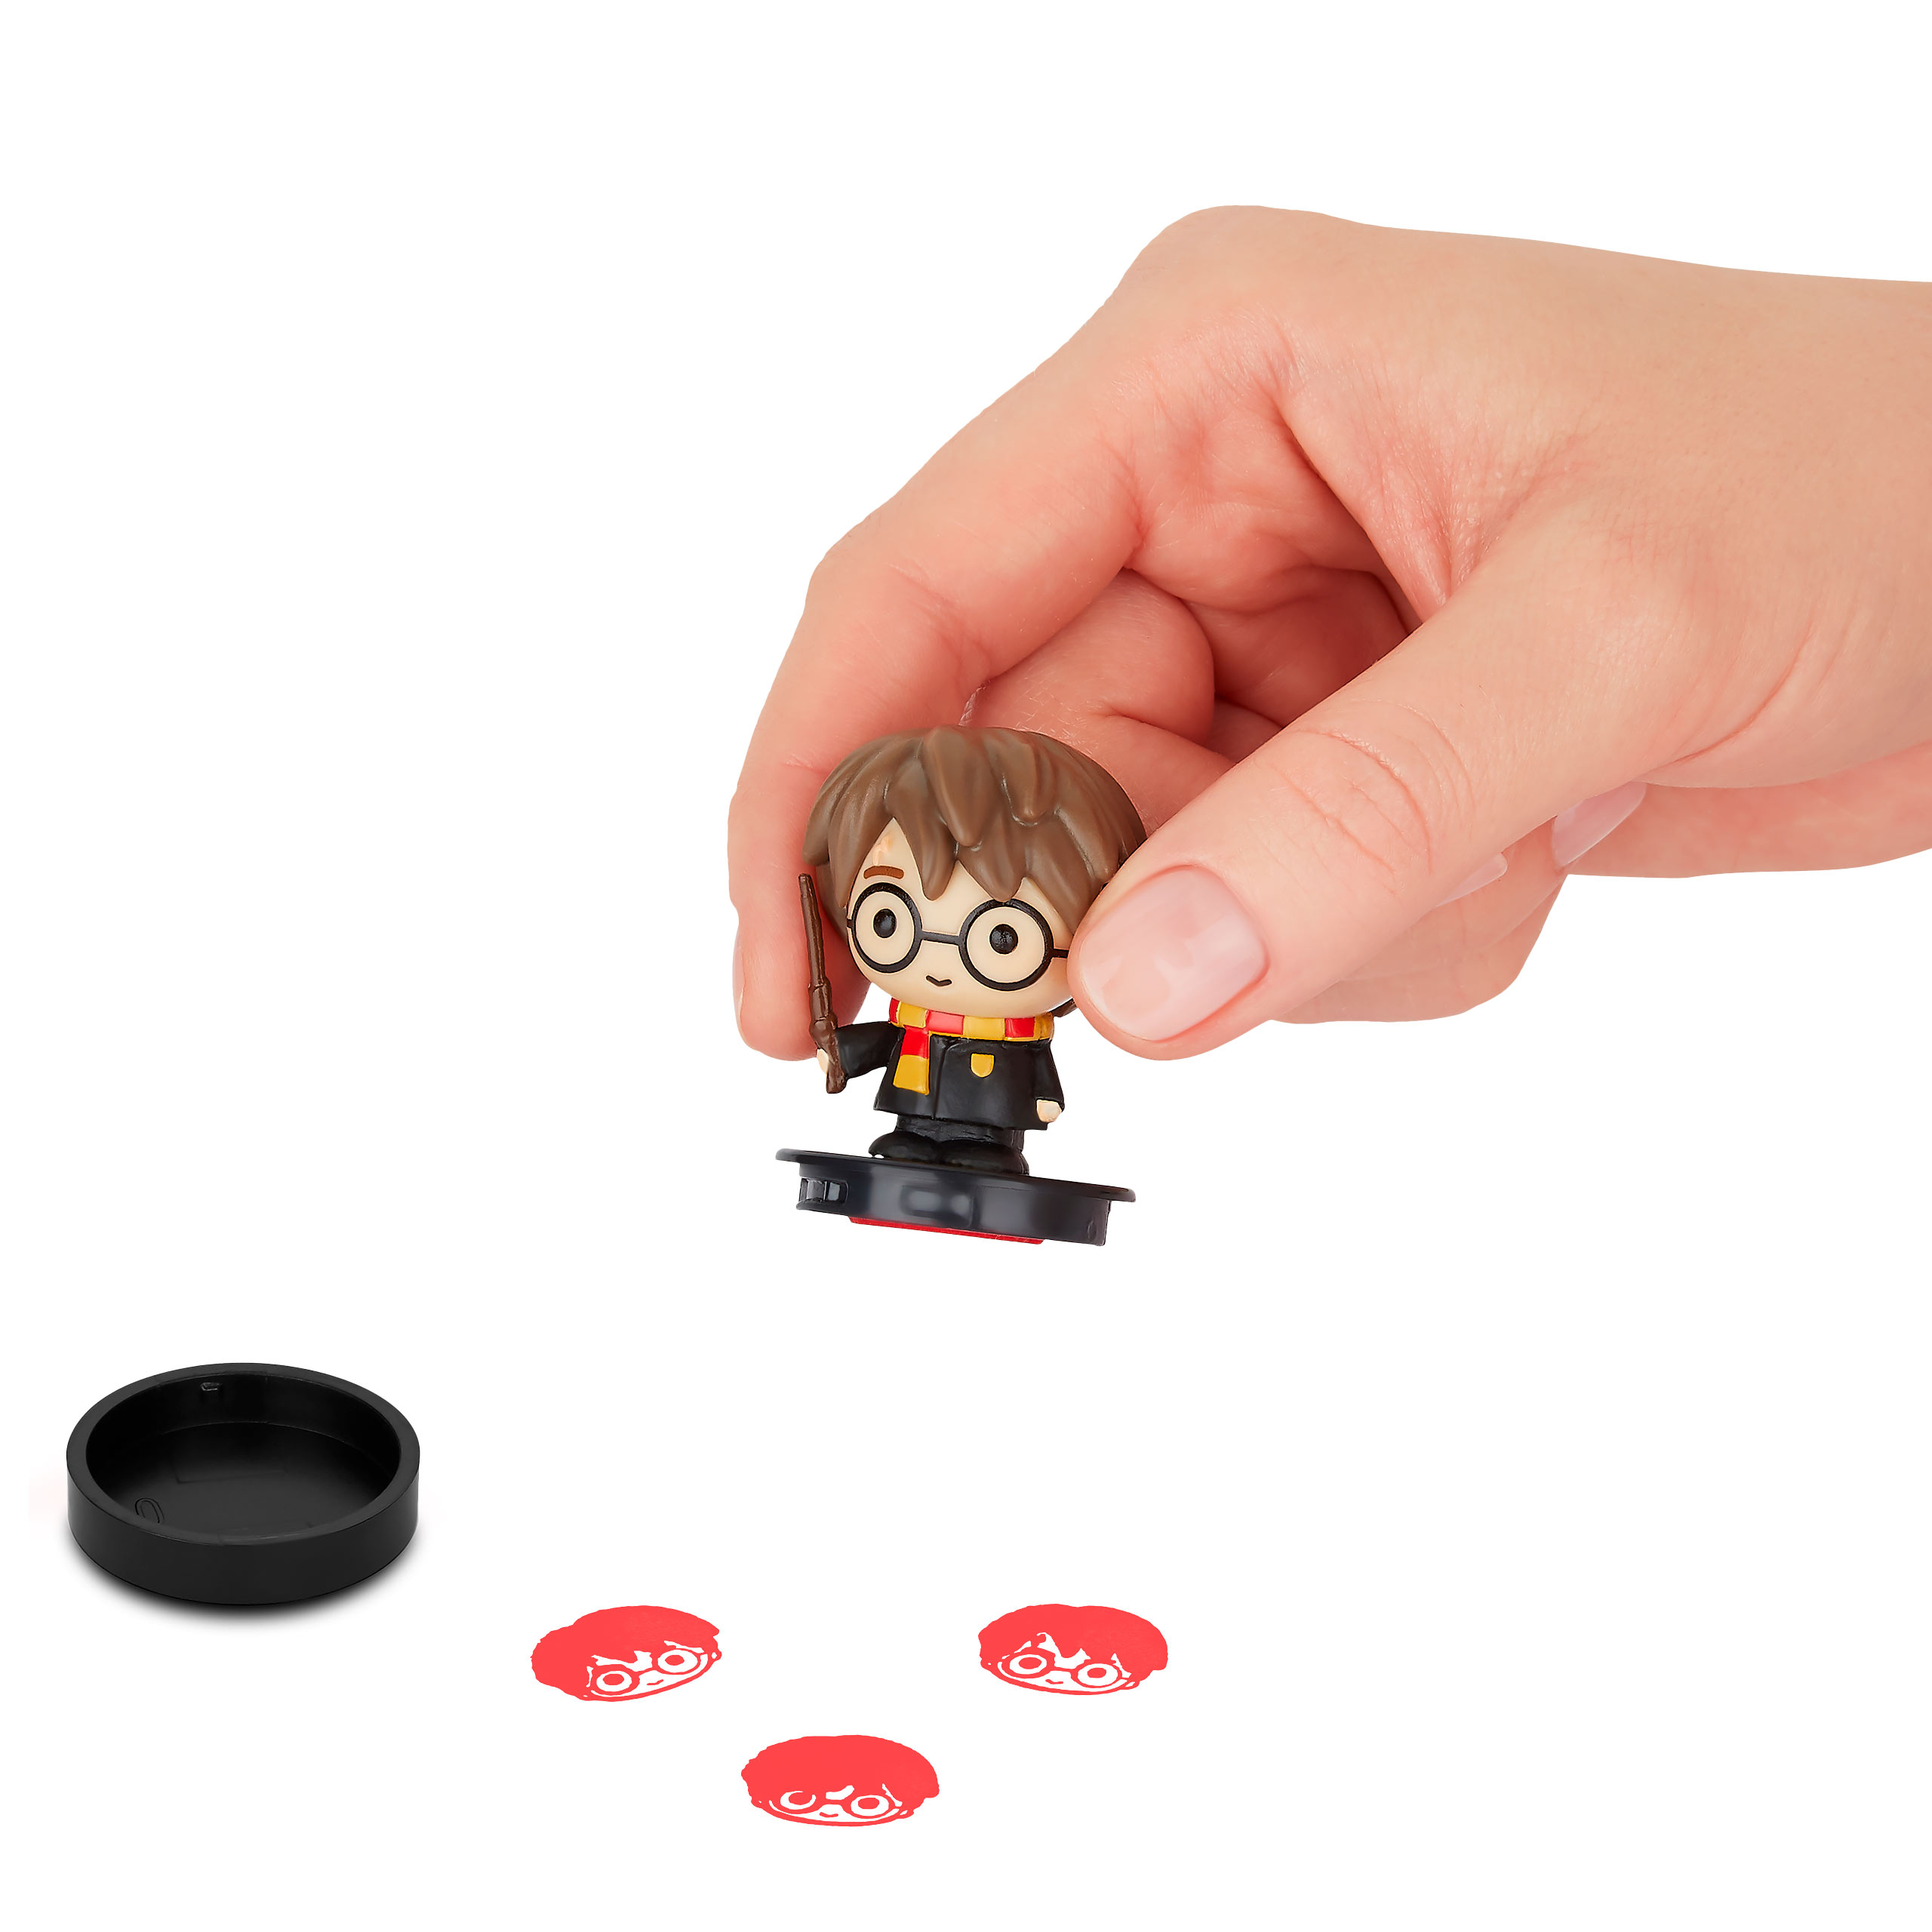 Harry Potter - Mystery Minis Figur mit Stempel